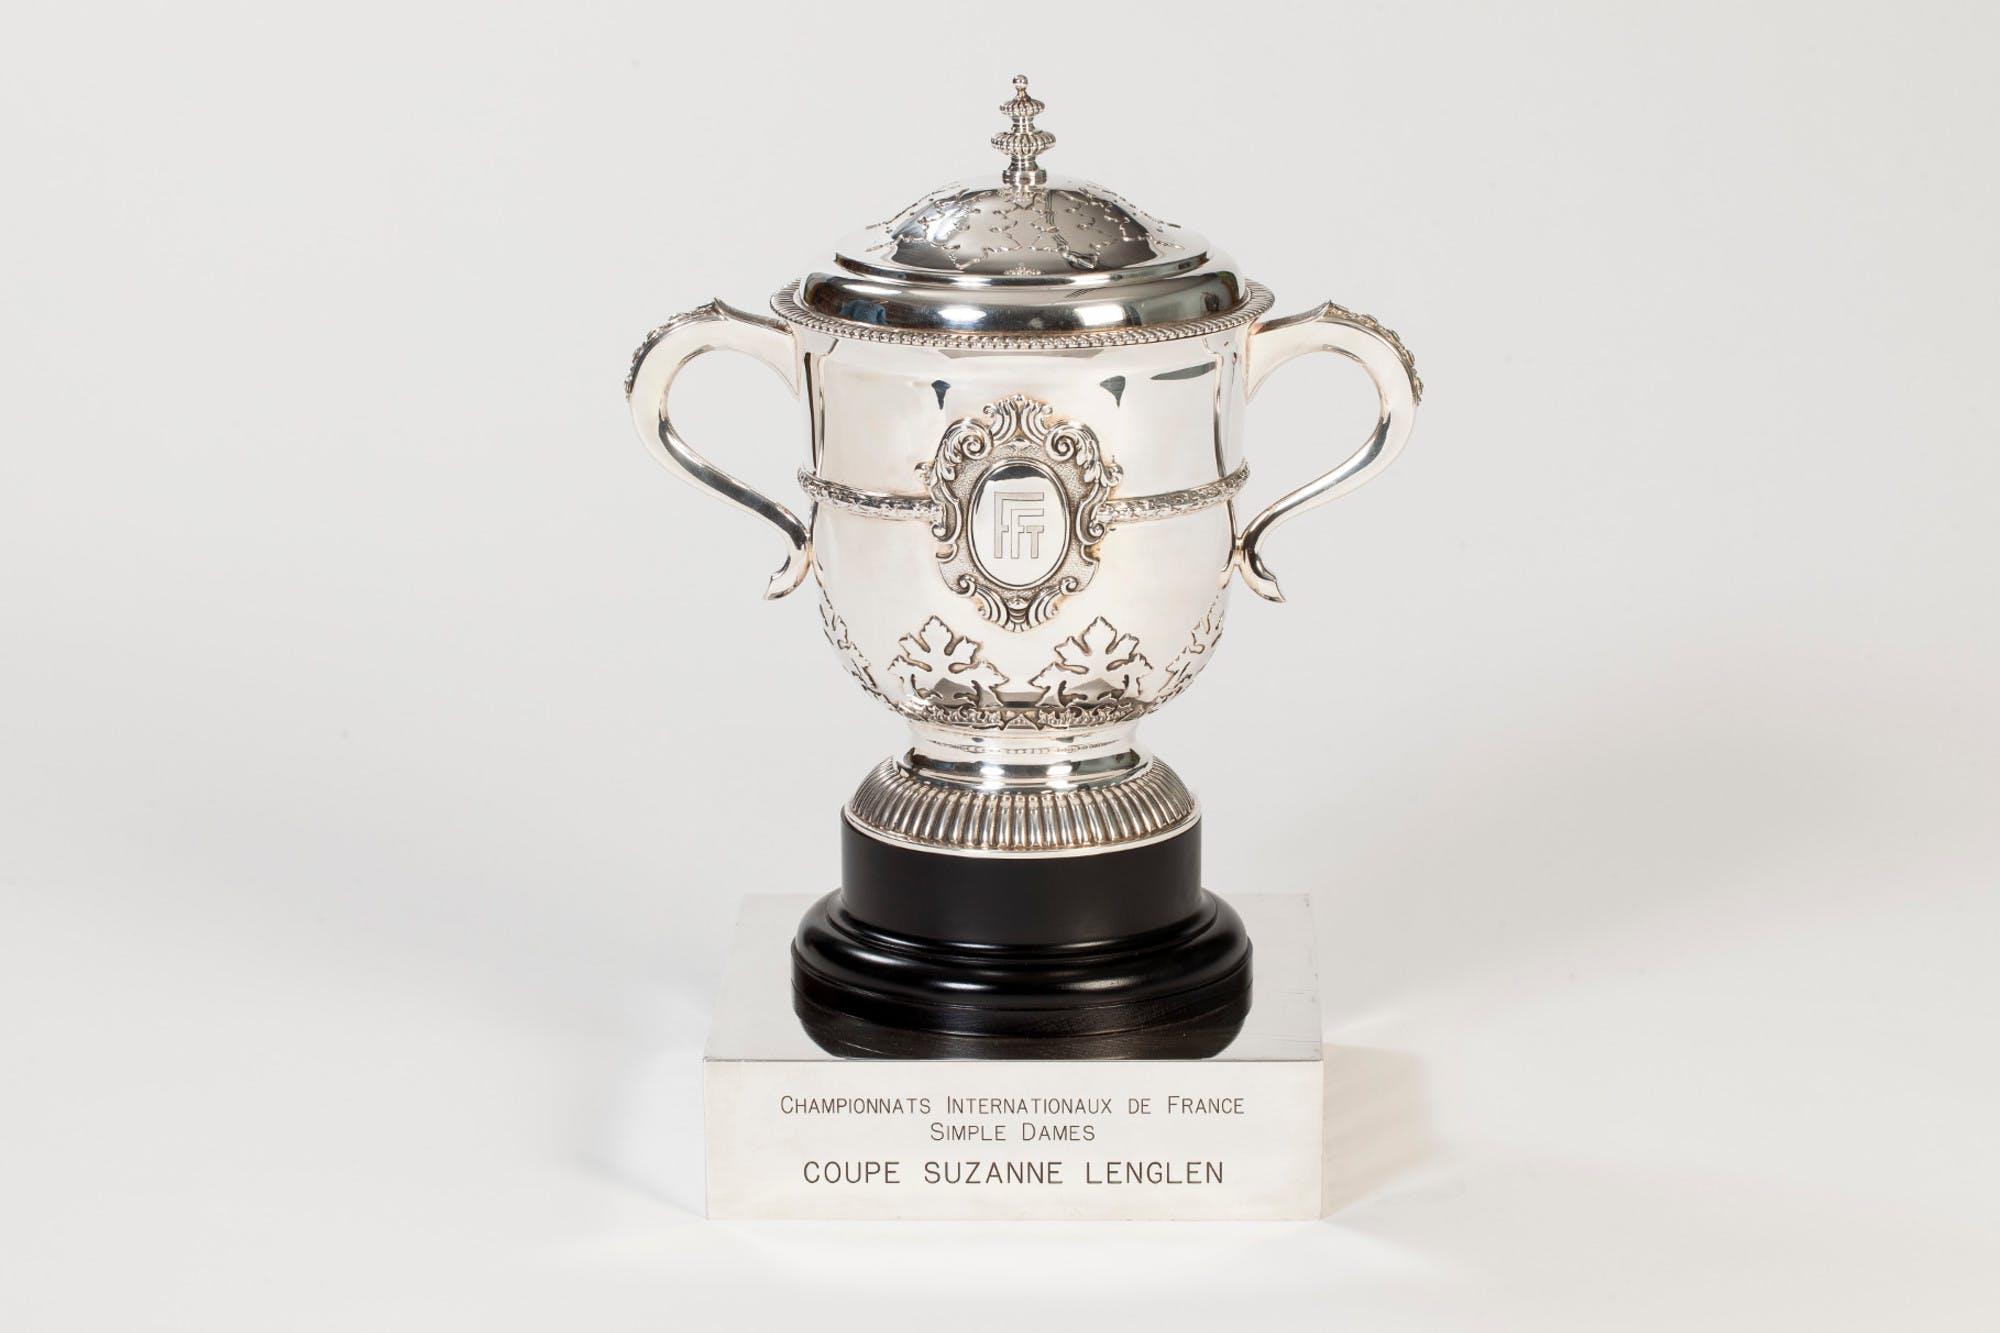 The trophies - Roland-Garros - The 2020 Roland-Garros Tournament official site